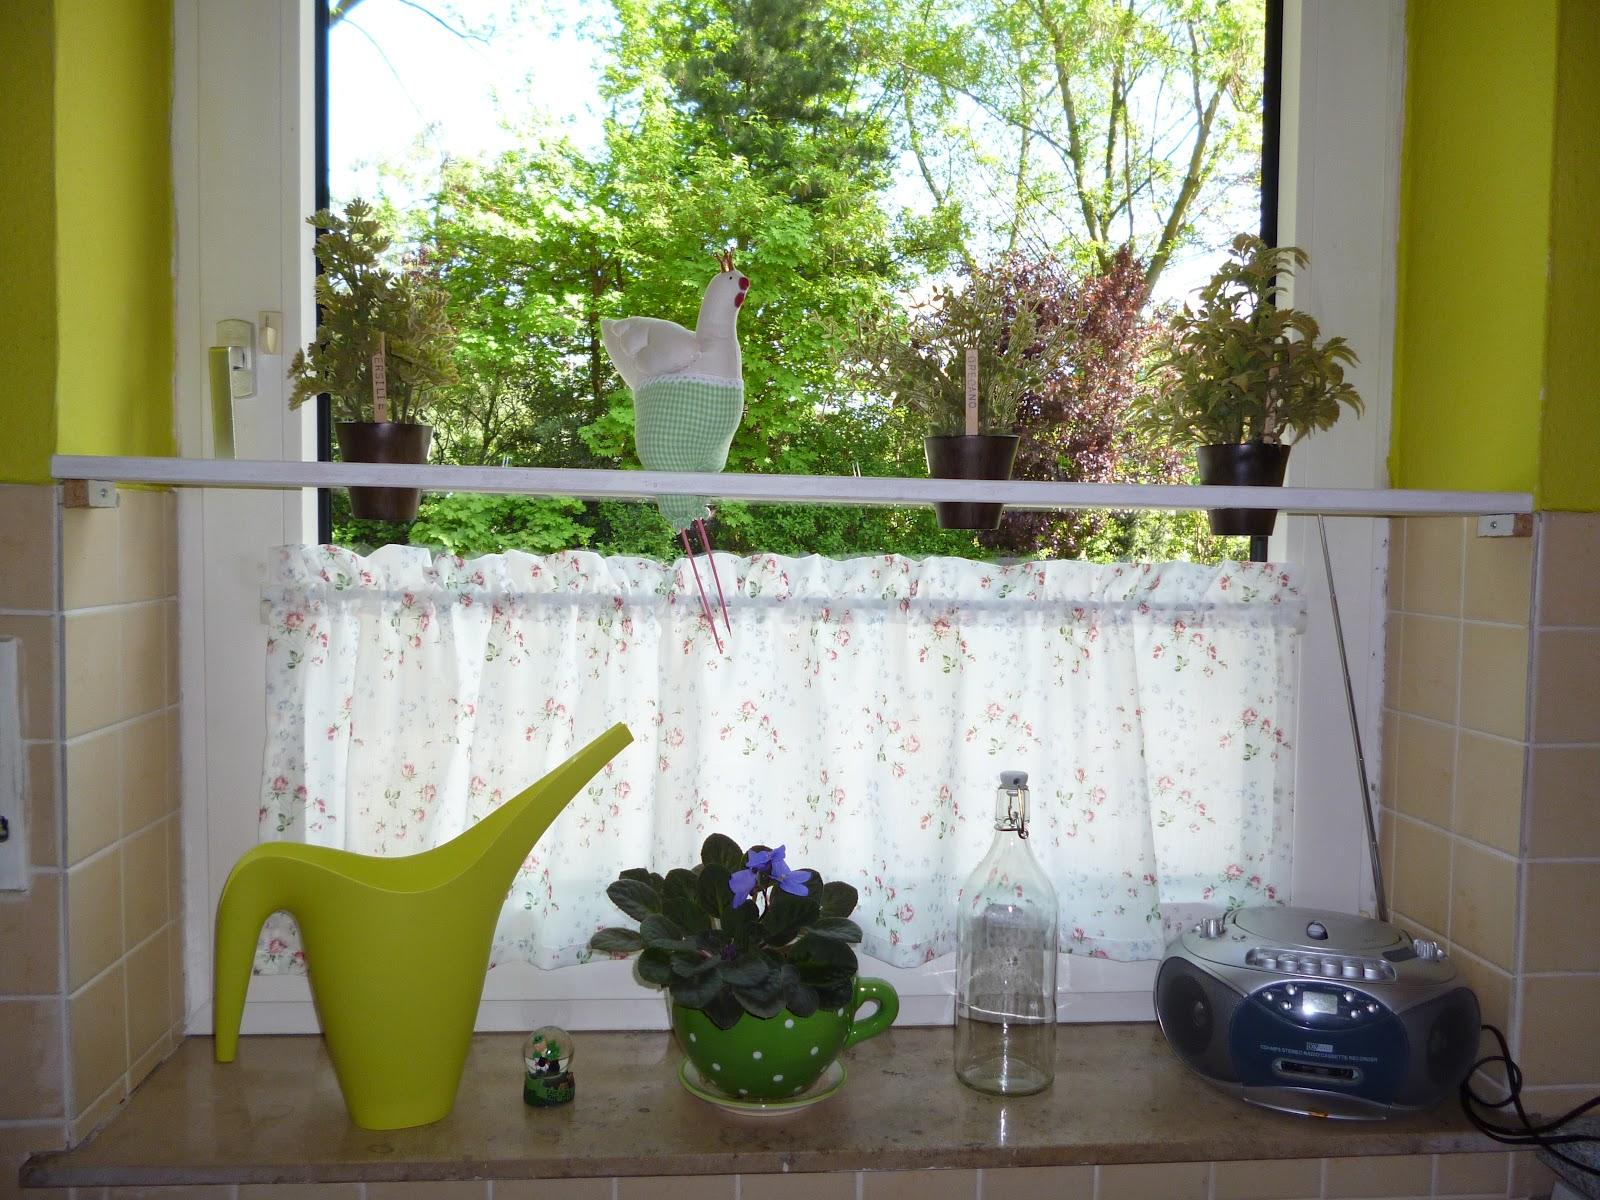 k chenfenster m bel ideen und home design inspiration. Black Bedroom Furniture Sets. Home Design Ideas